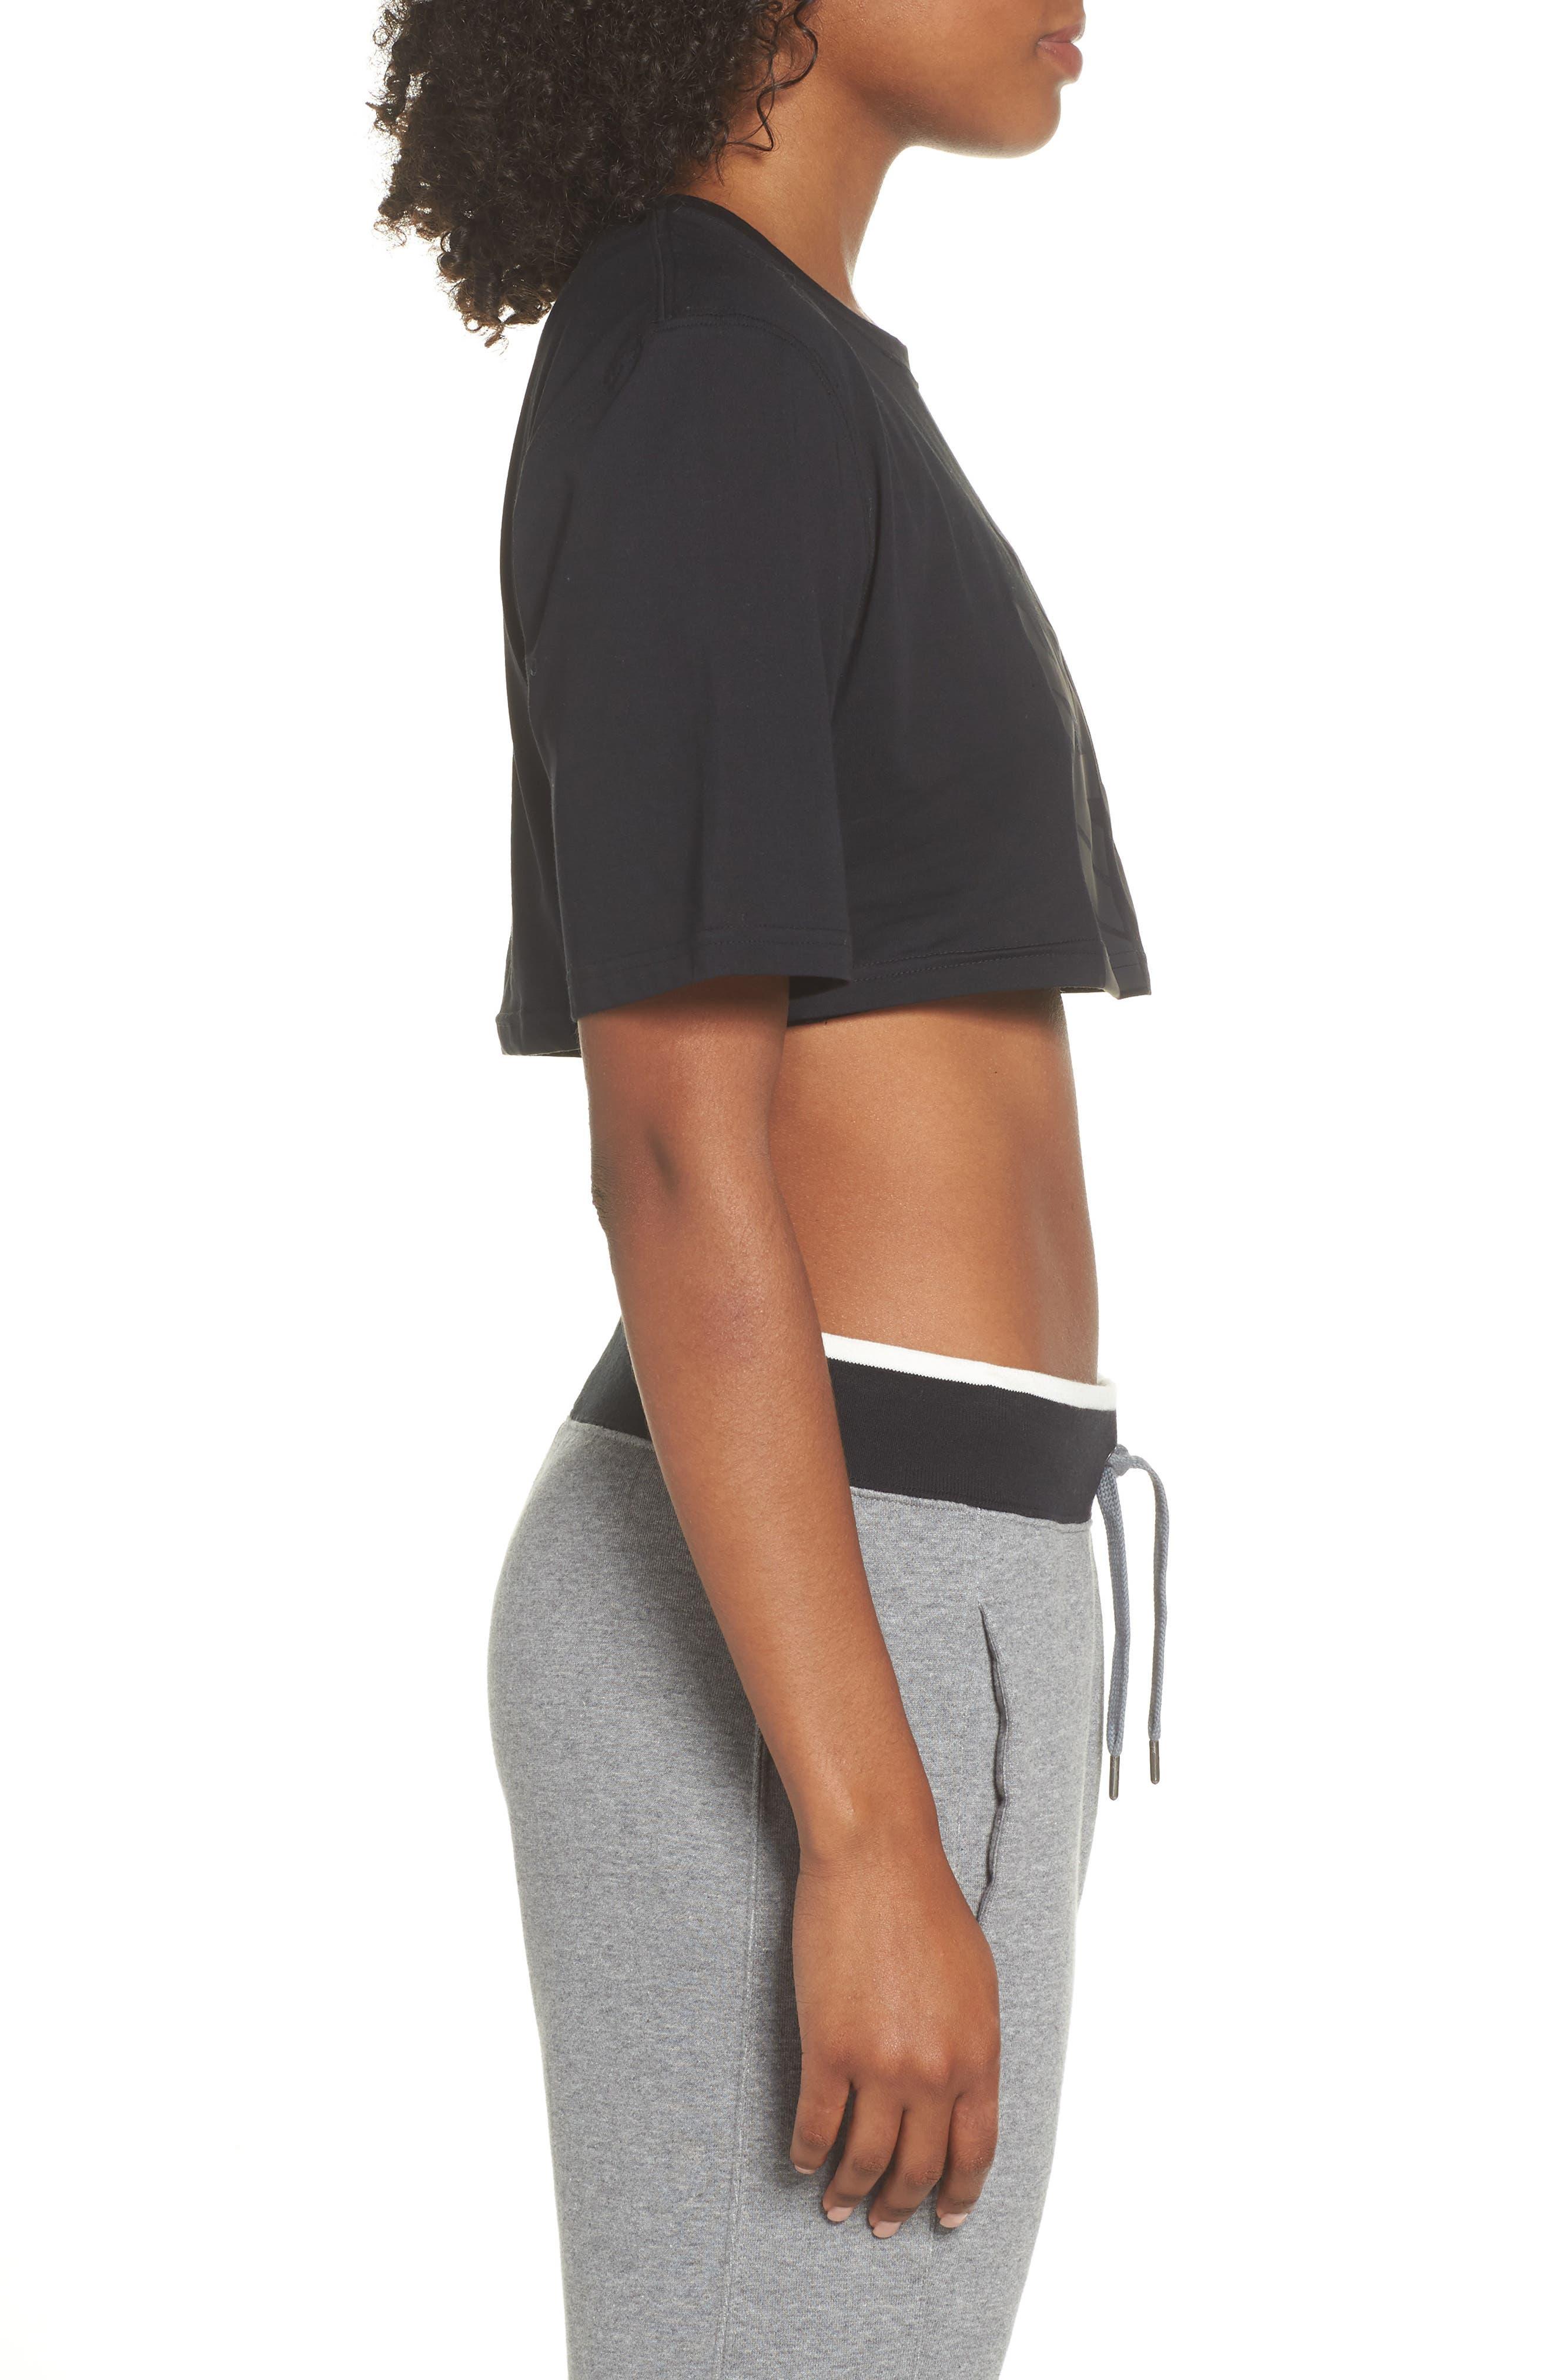 NikeLab Collection Jersey Crop Top,                             Alternate thumbnail 3, color,                             BLACK/ BLACK